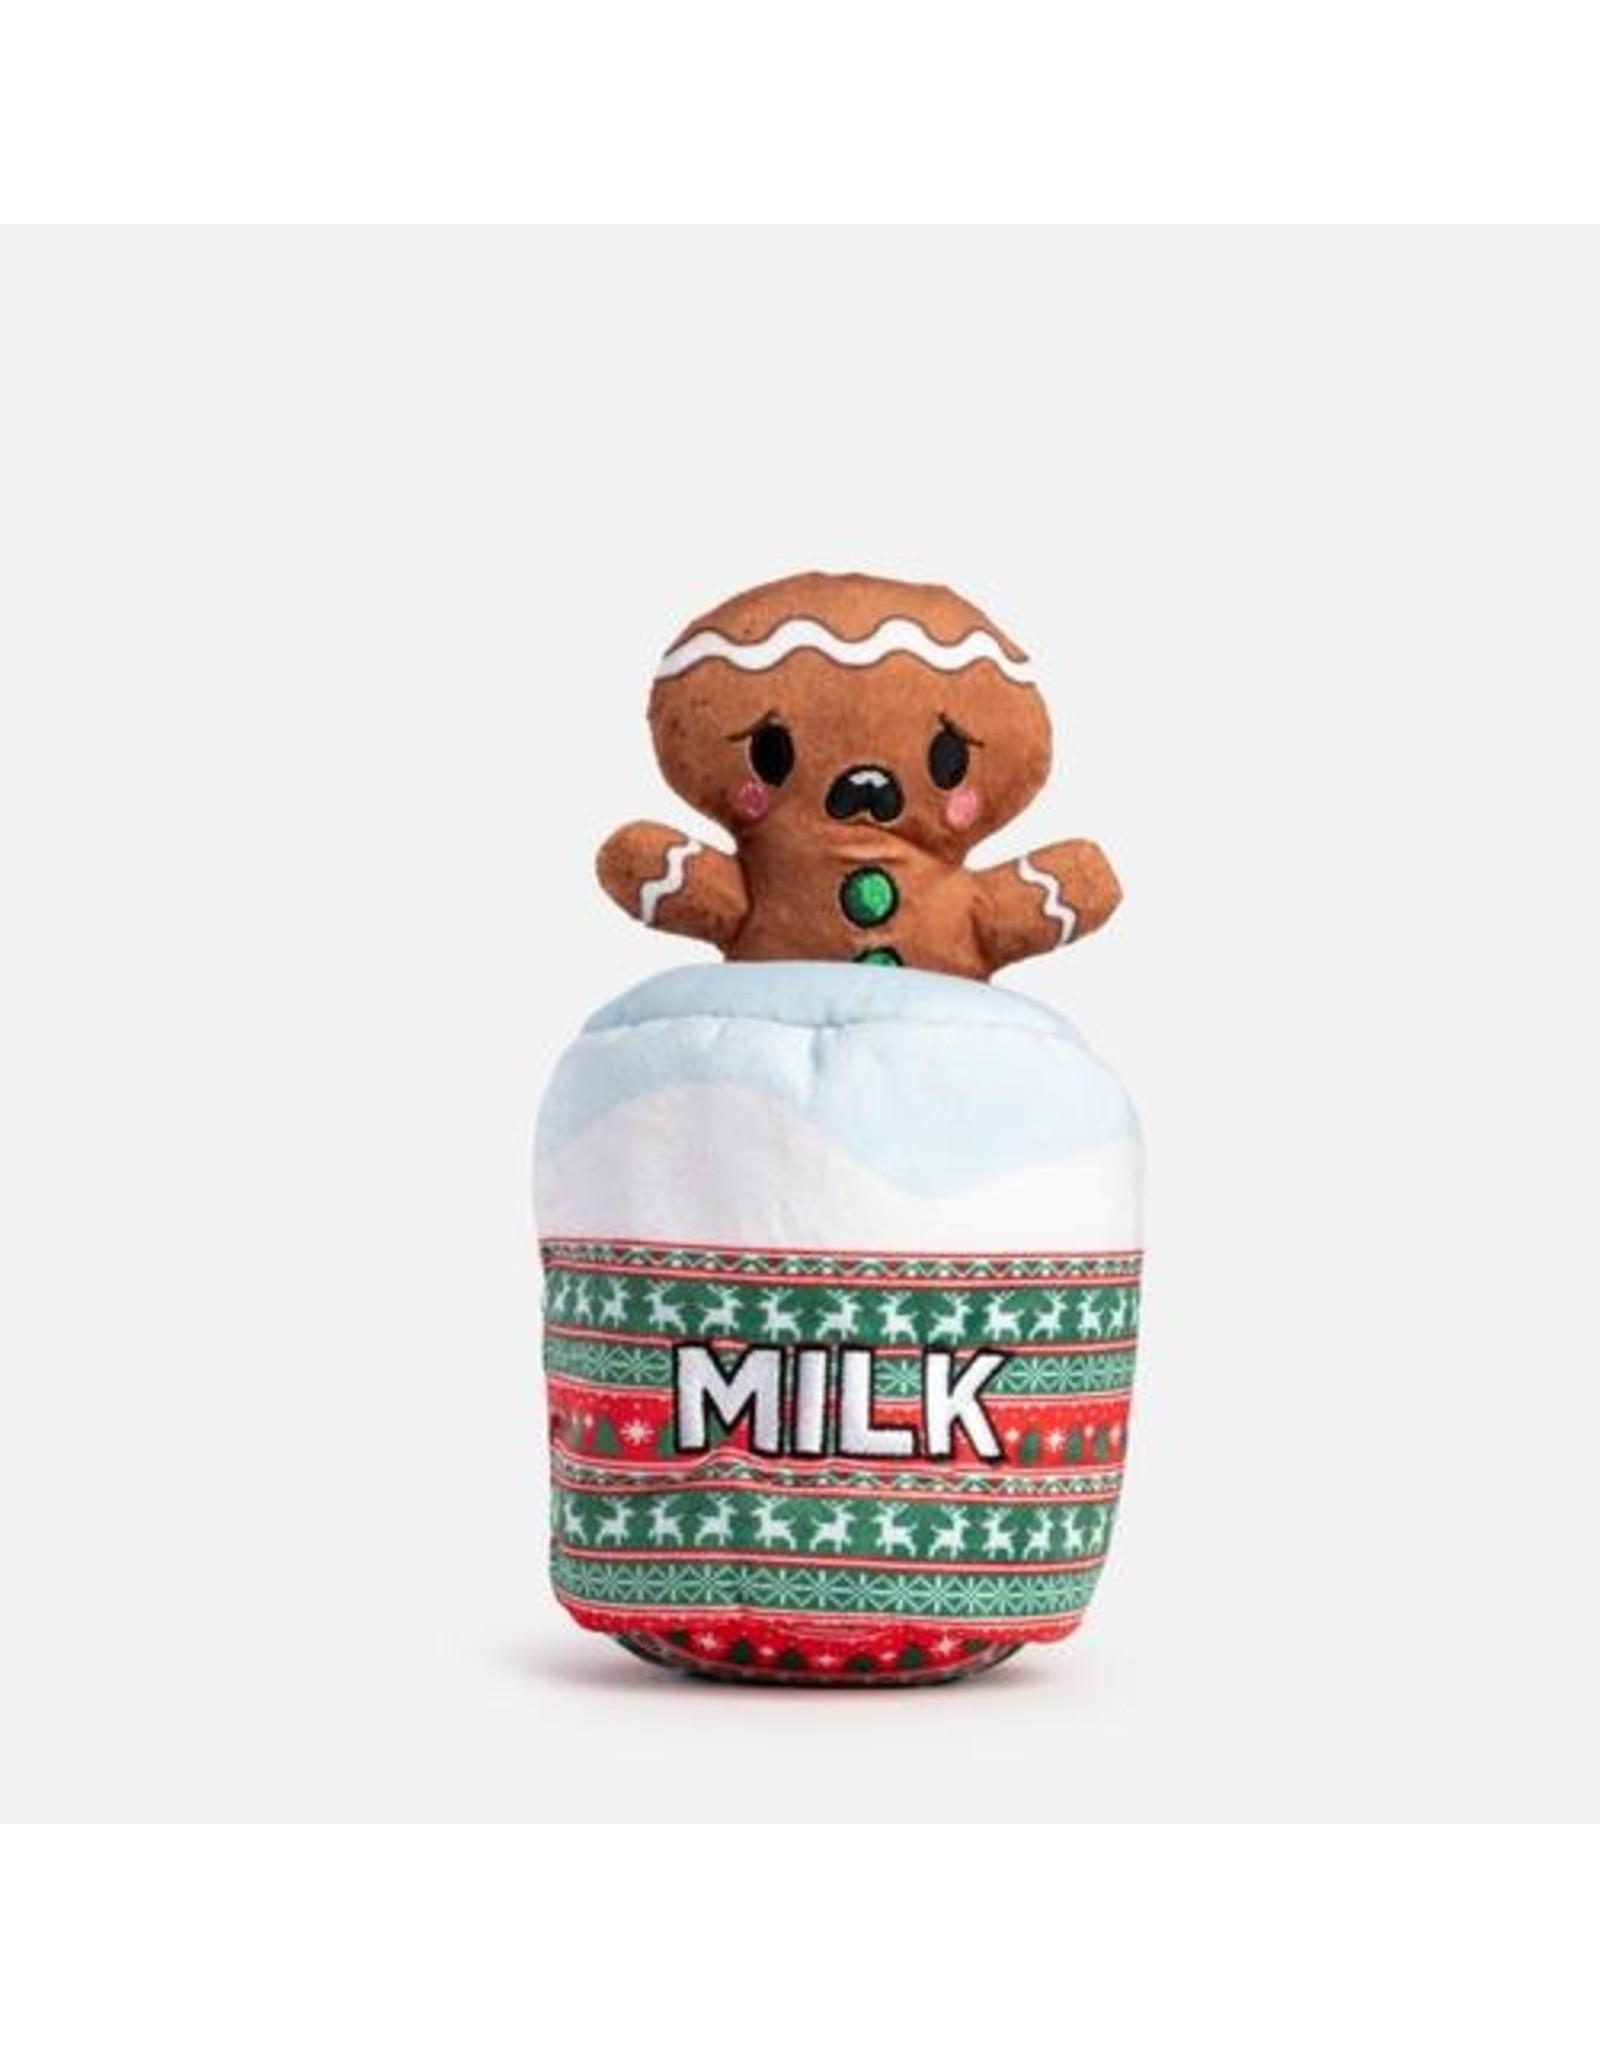 Silver Paw Milk Glass 2-in-1 Toy